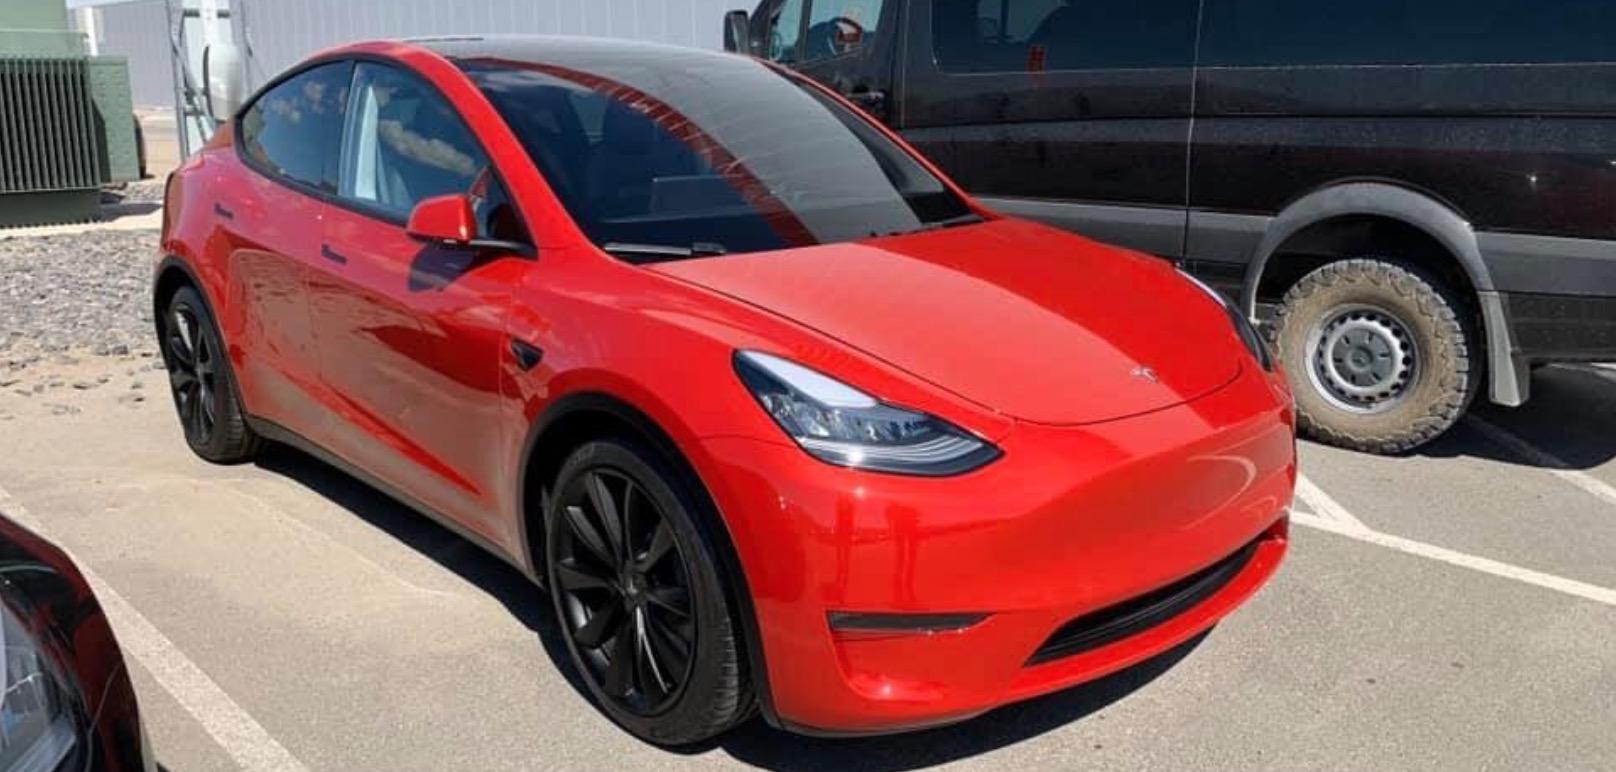 Tesla Model Y: beautiful new bright red prototype spotted at Gigafactory 1 - Electrek